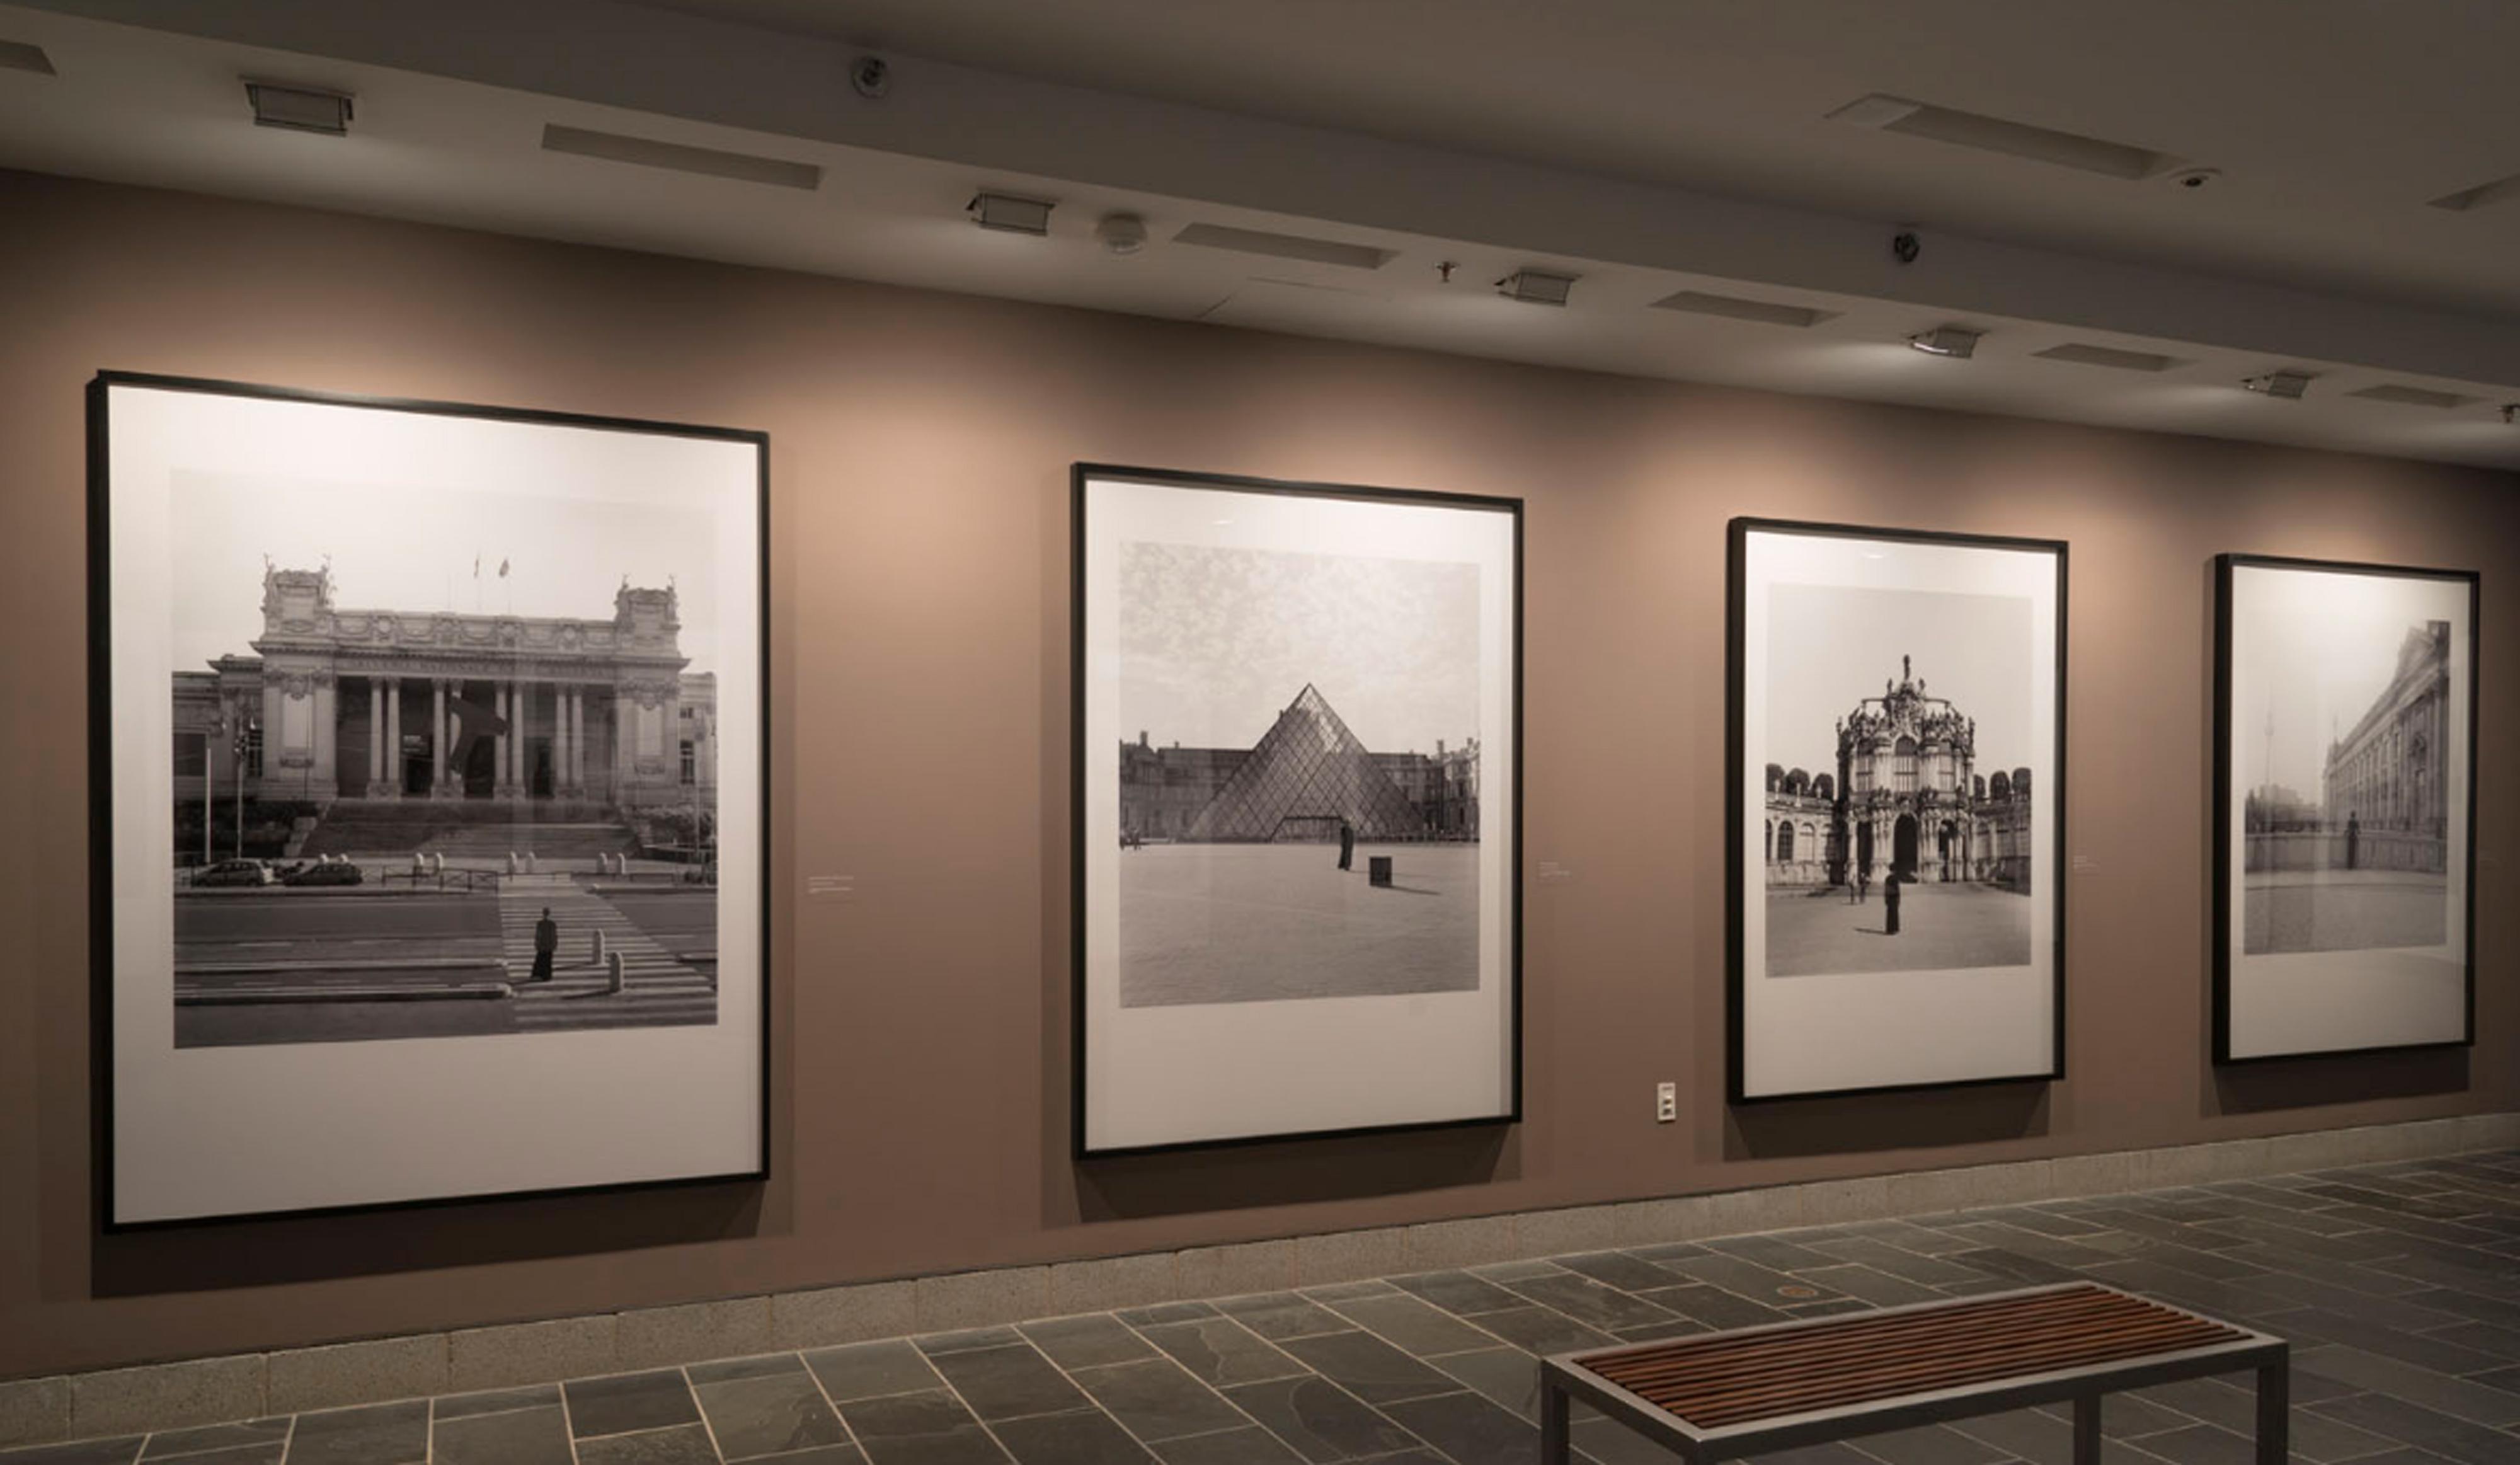 Galerie Barbara Thumm \ The Museum Series